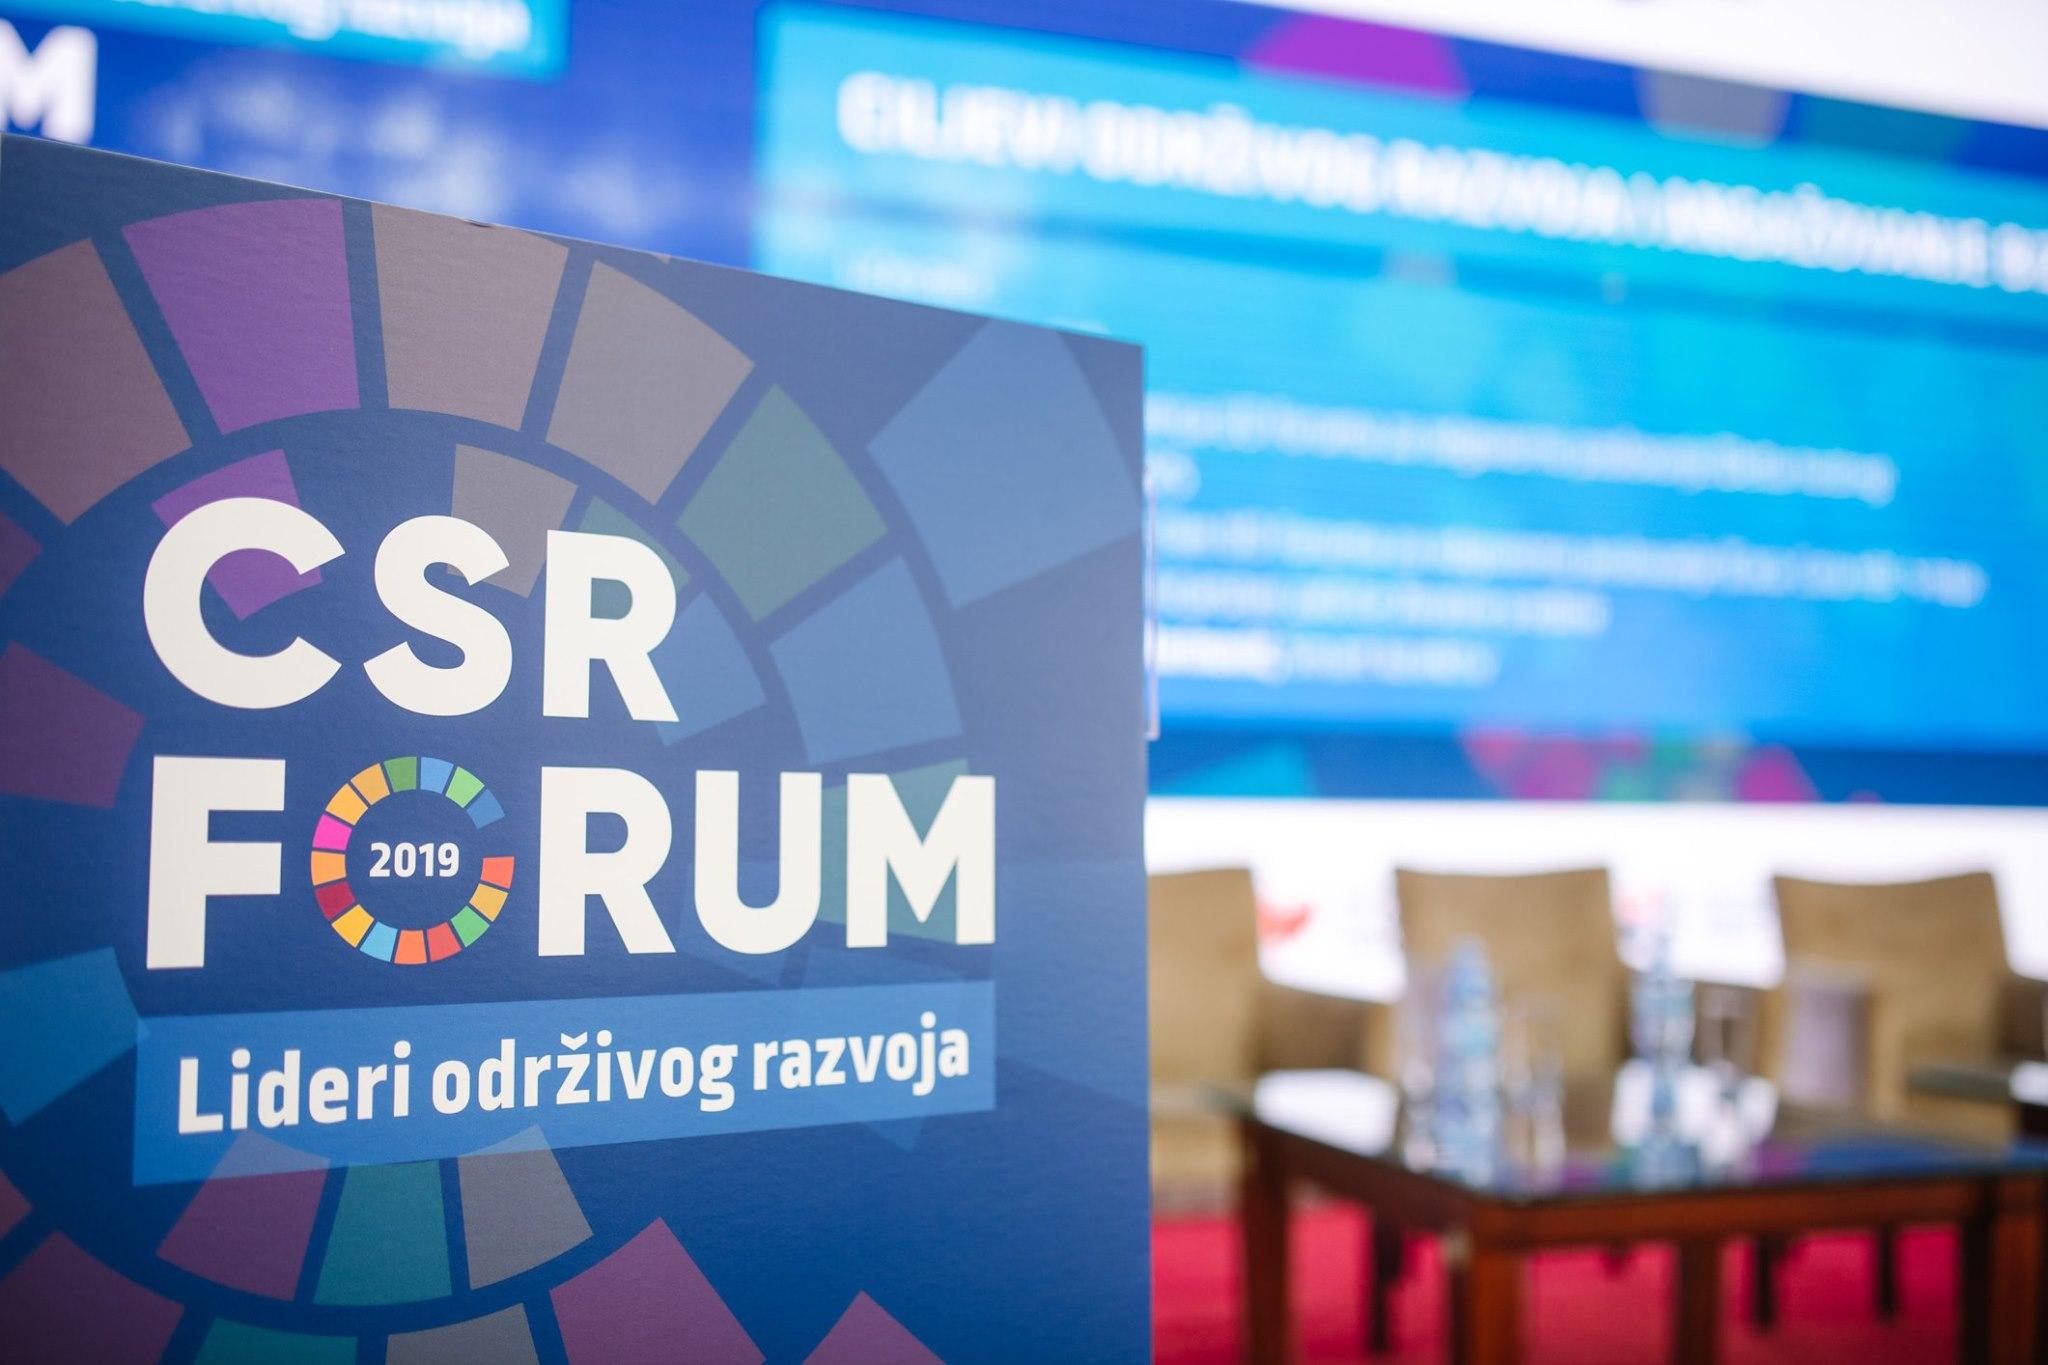 CSR Forum 2019